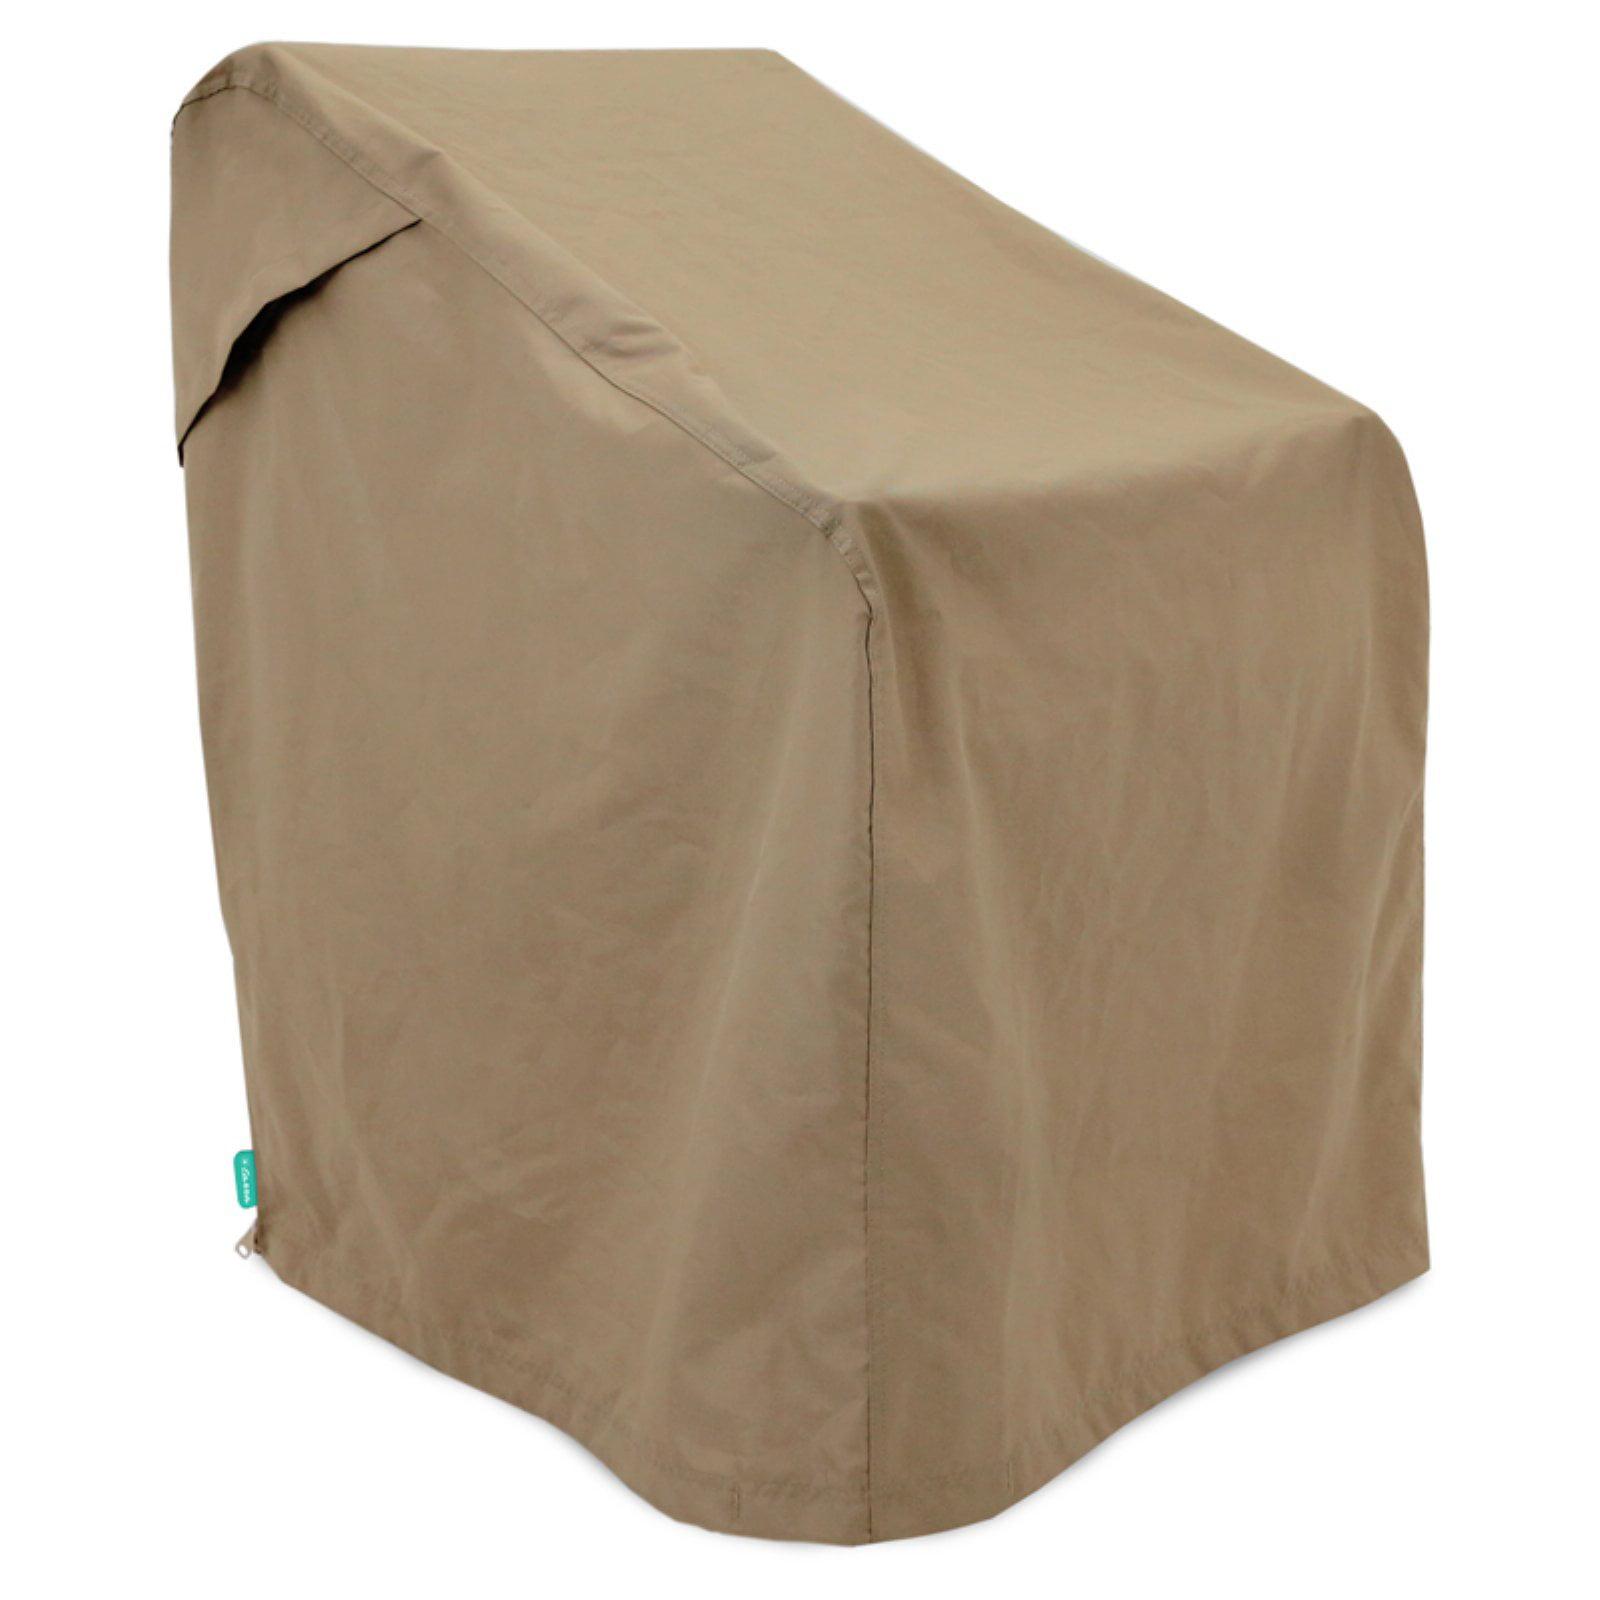 Tarra Home Universal Outdoor UFCCP463242PT Patio Chair Cover